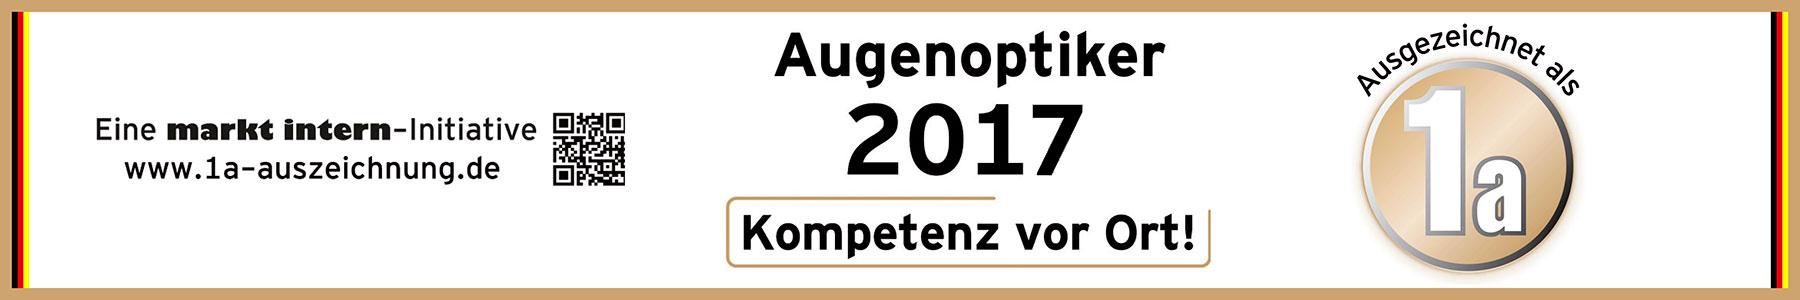 slider_rutschmann.jpg